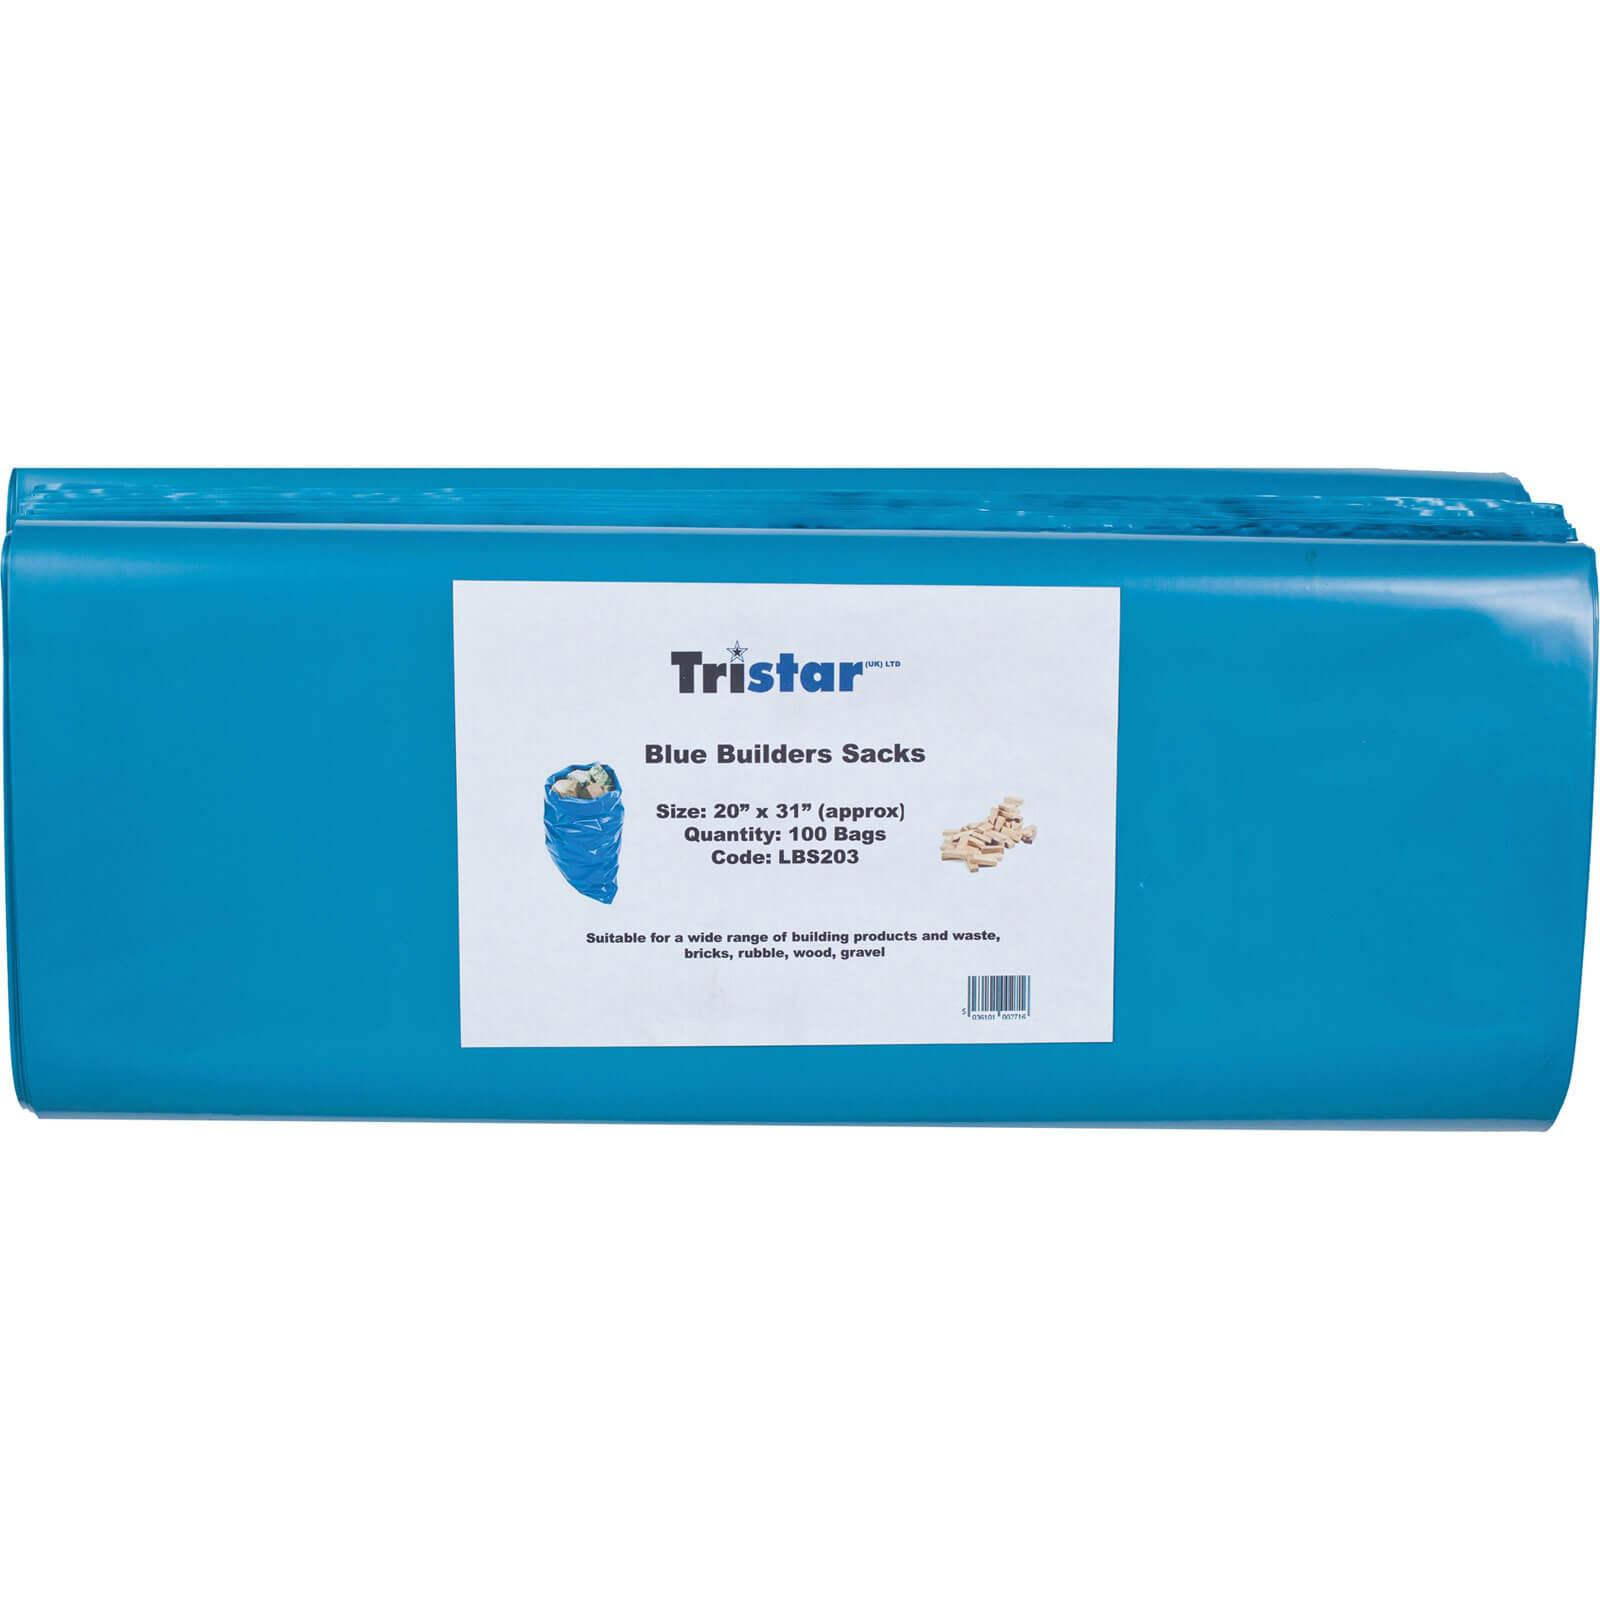 Tristar Blue Builders Sack Pack of 100